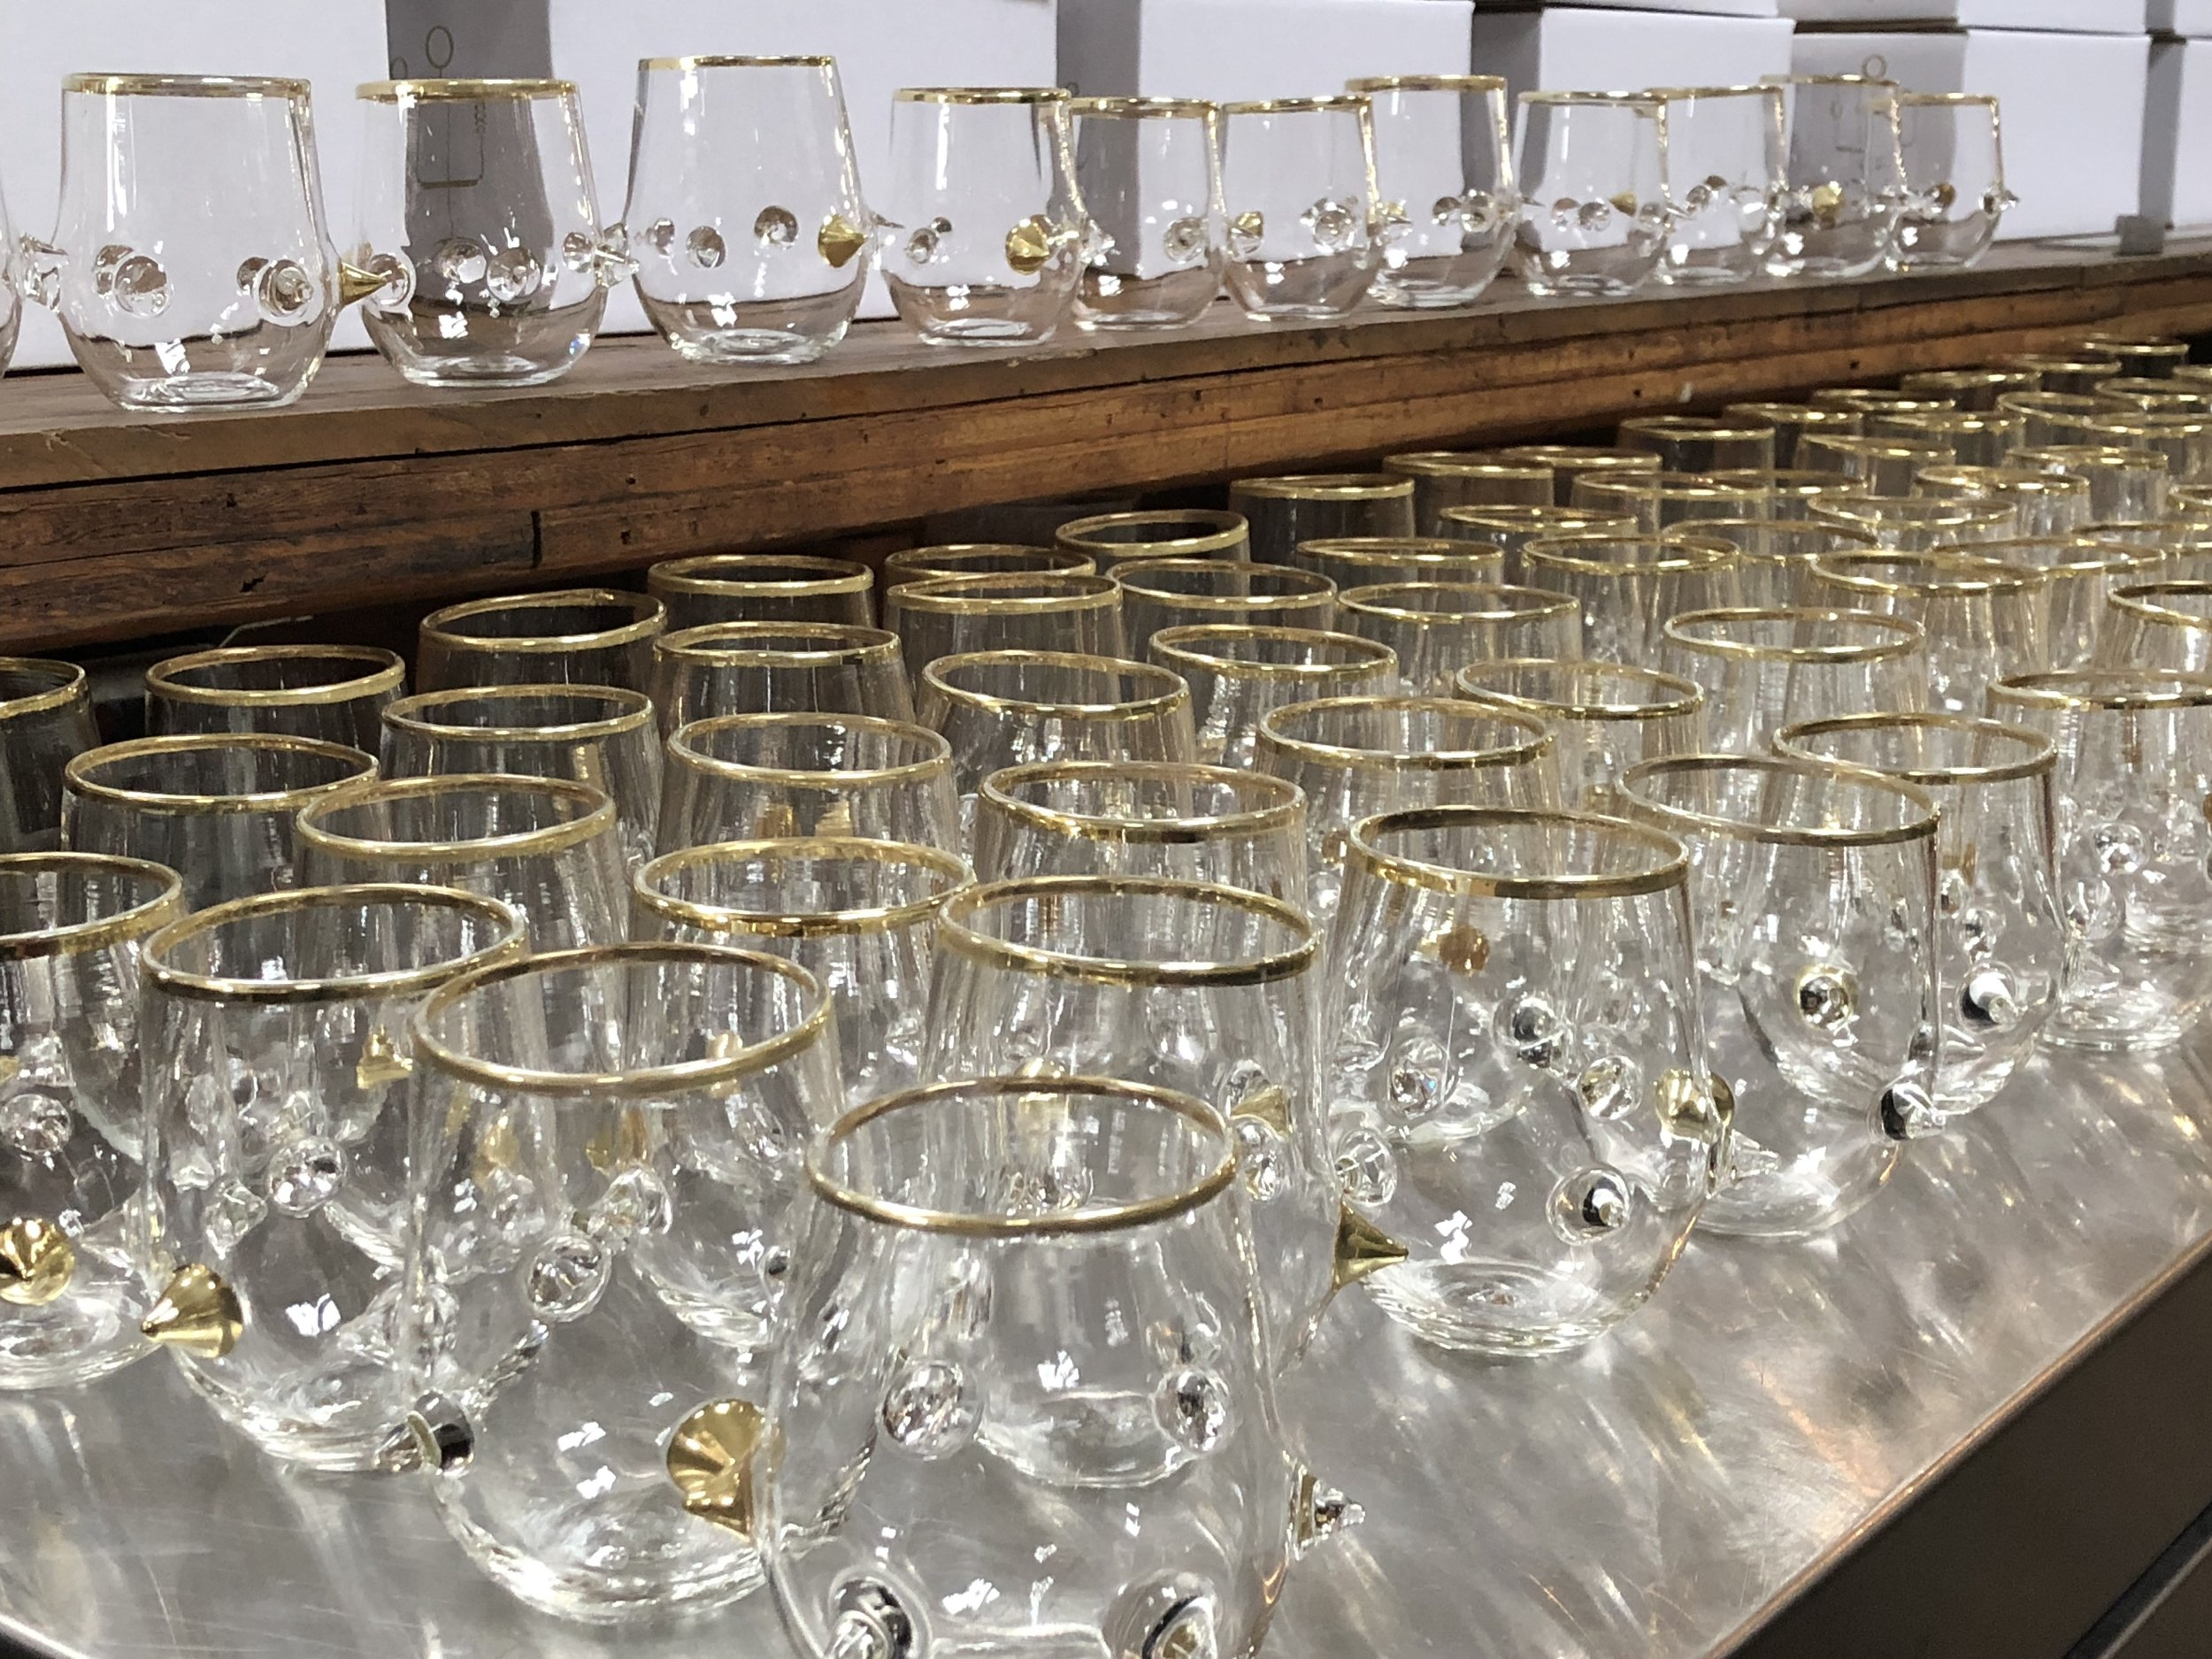 Our custom-ordered Golden Spike glasses. Gorgeous!